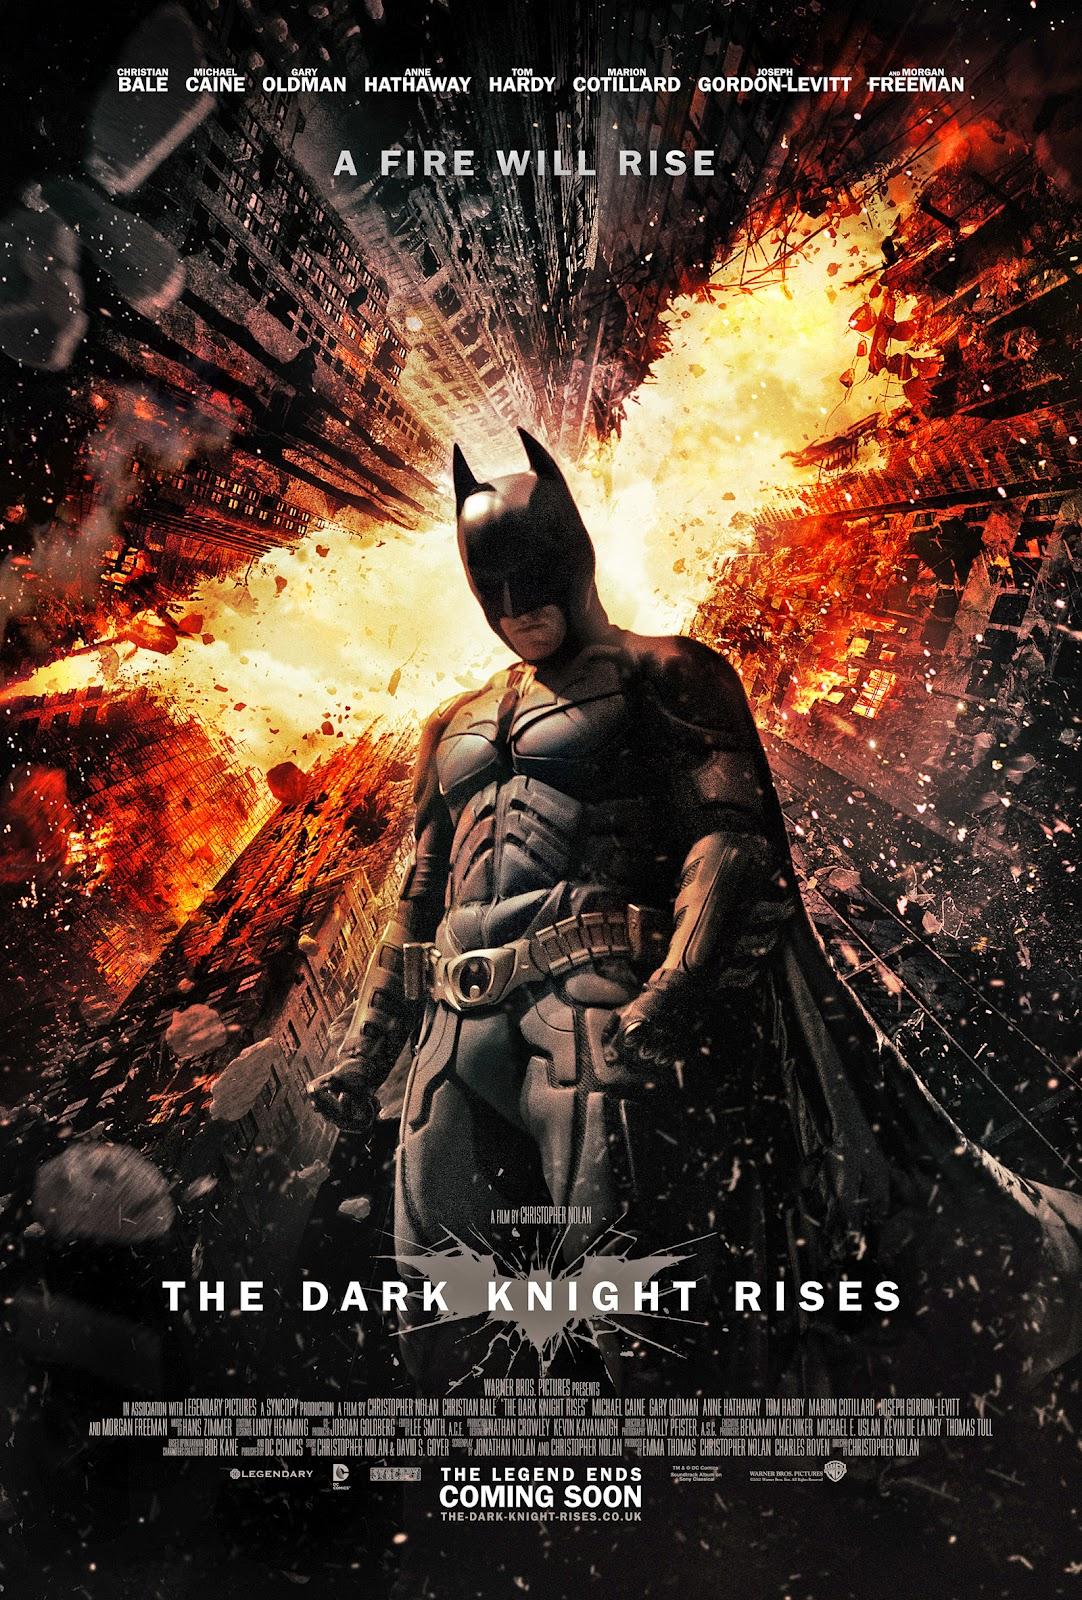 http://4.bp.blogspot.com/-rijlIVRKGW4/UAaUadMFtvI/AAAAAAAAAH0/ZCDjSNL4In0/s1600/The_Dark_Knight_Rises_poster.jpg